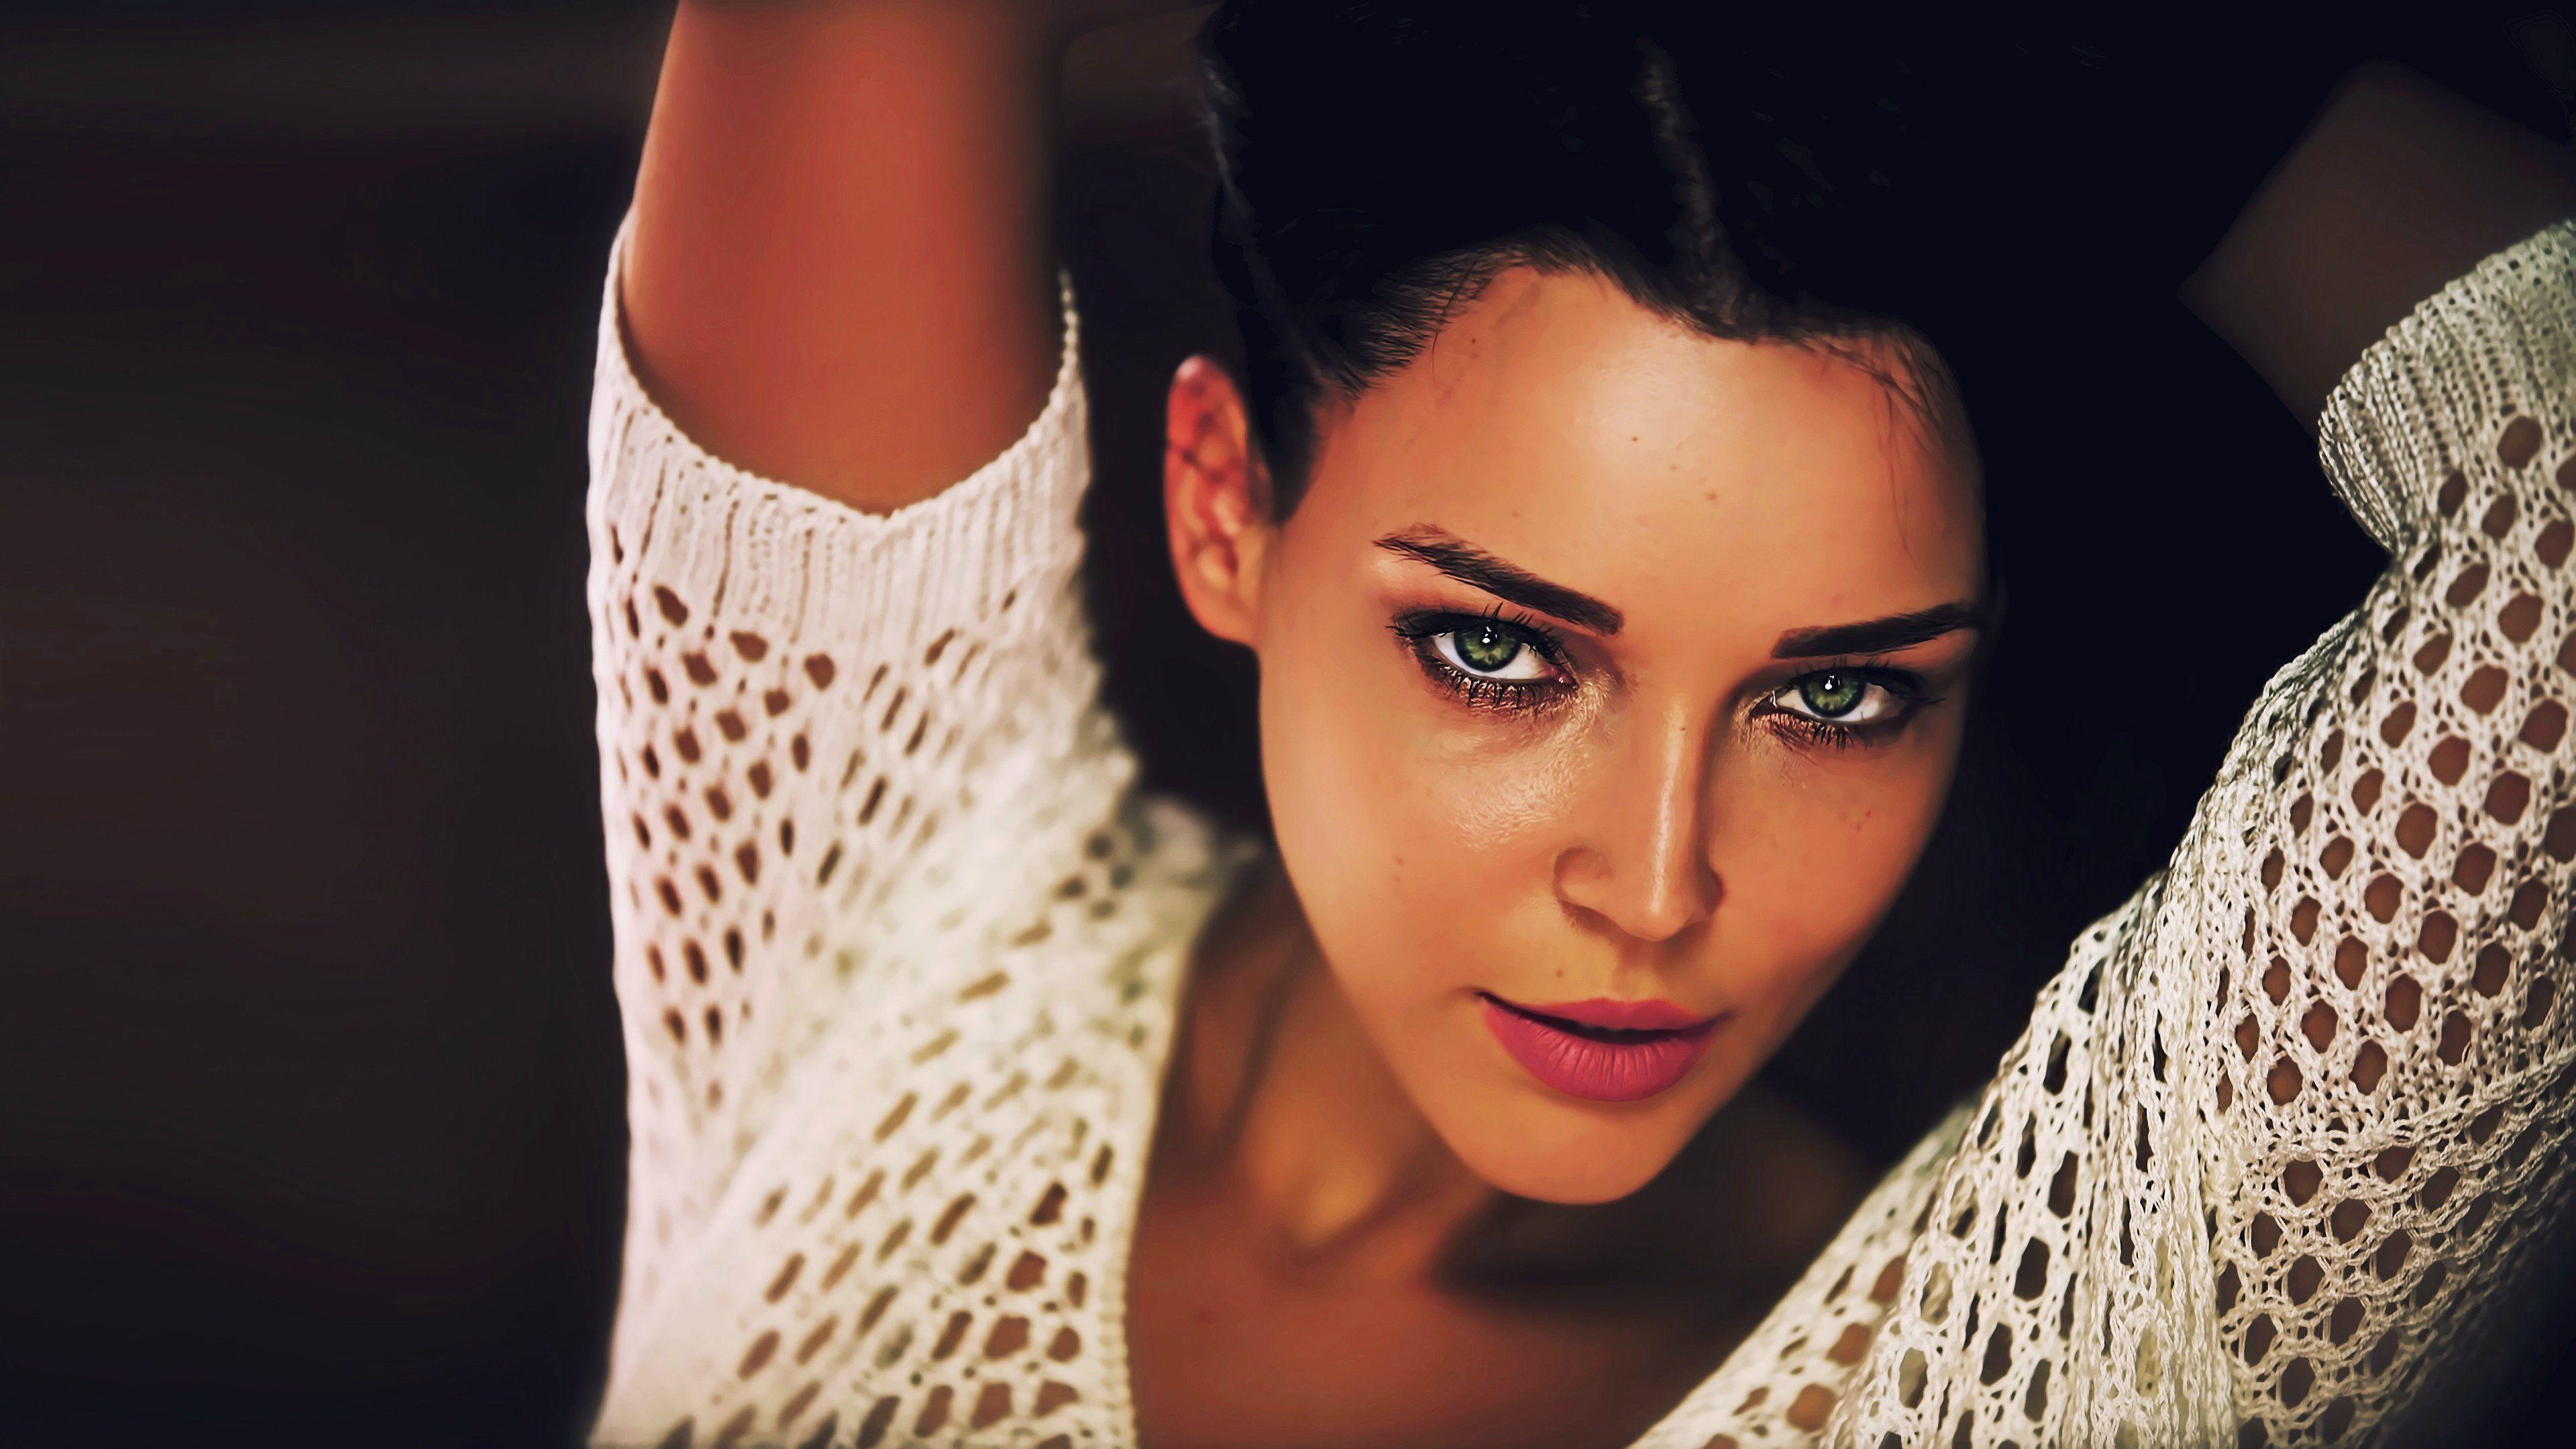 Angelina Petrova Wallpaper Desktop | Angelina, Hazel eyes